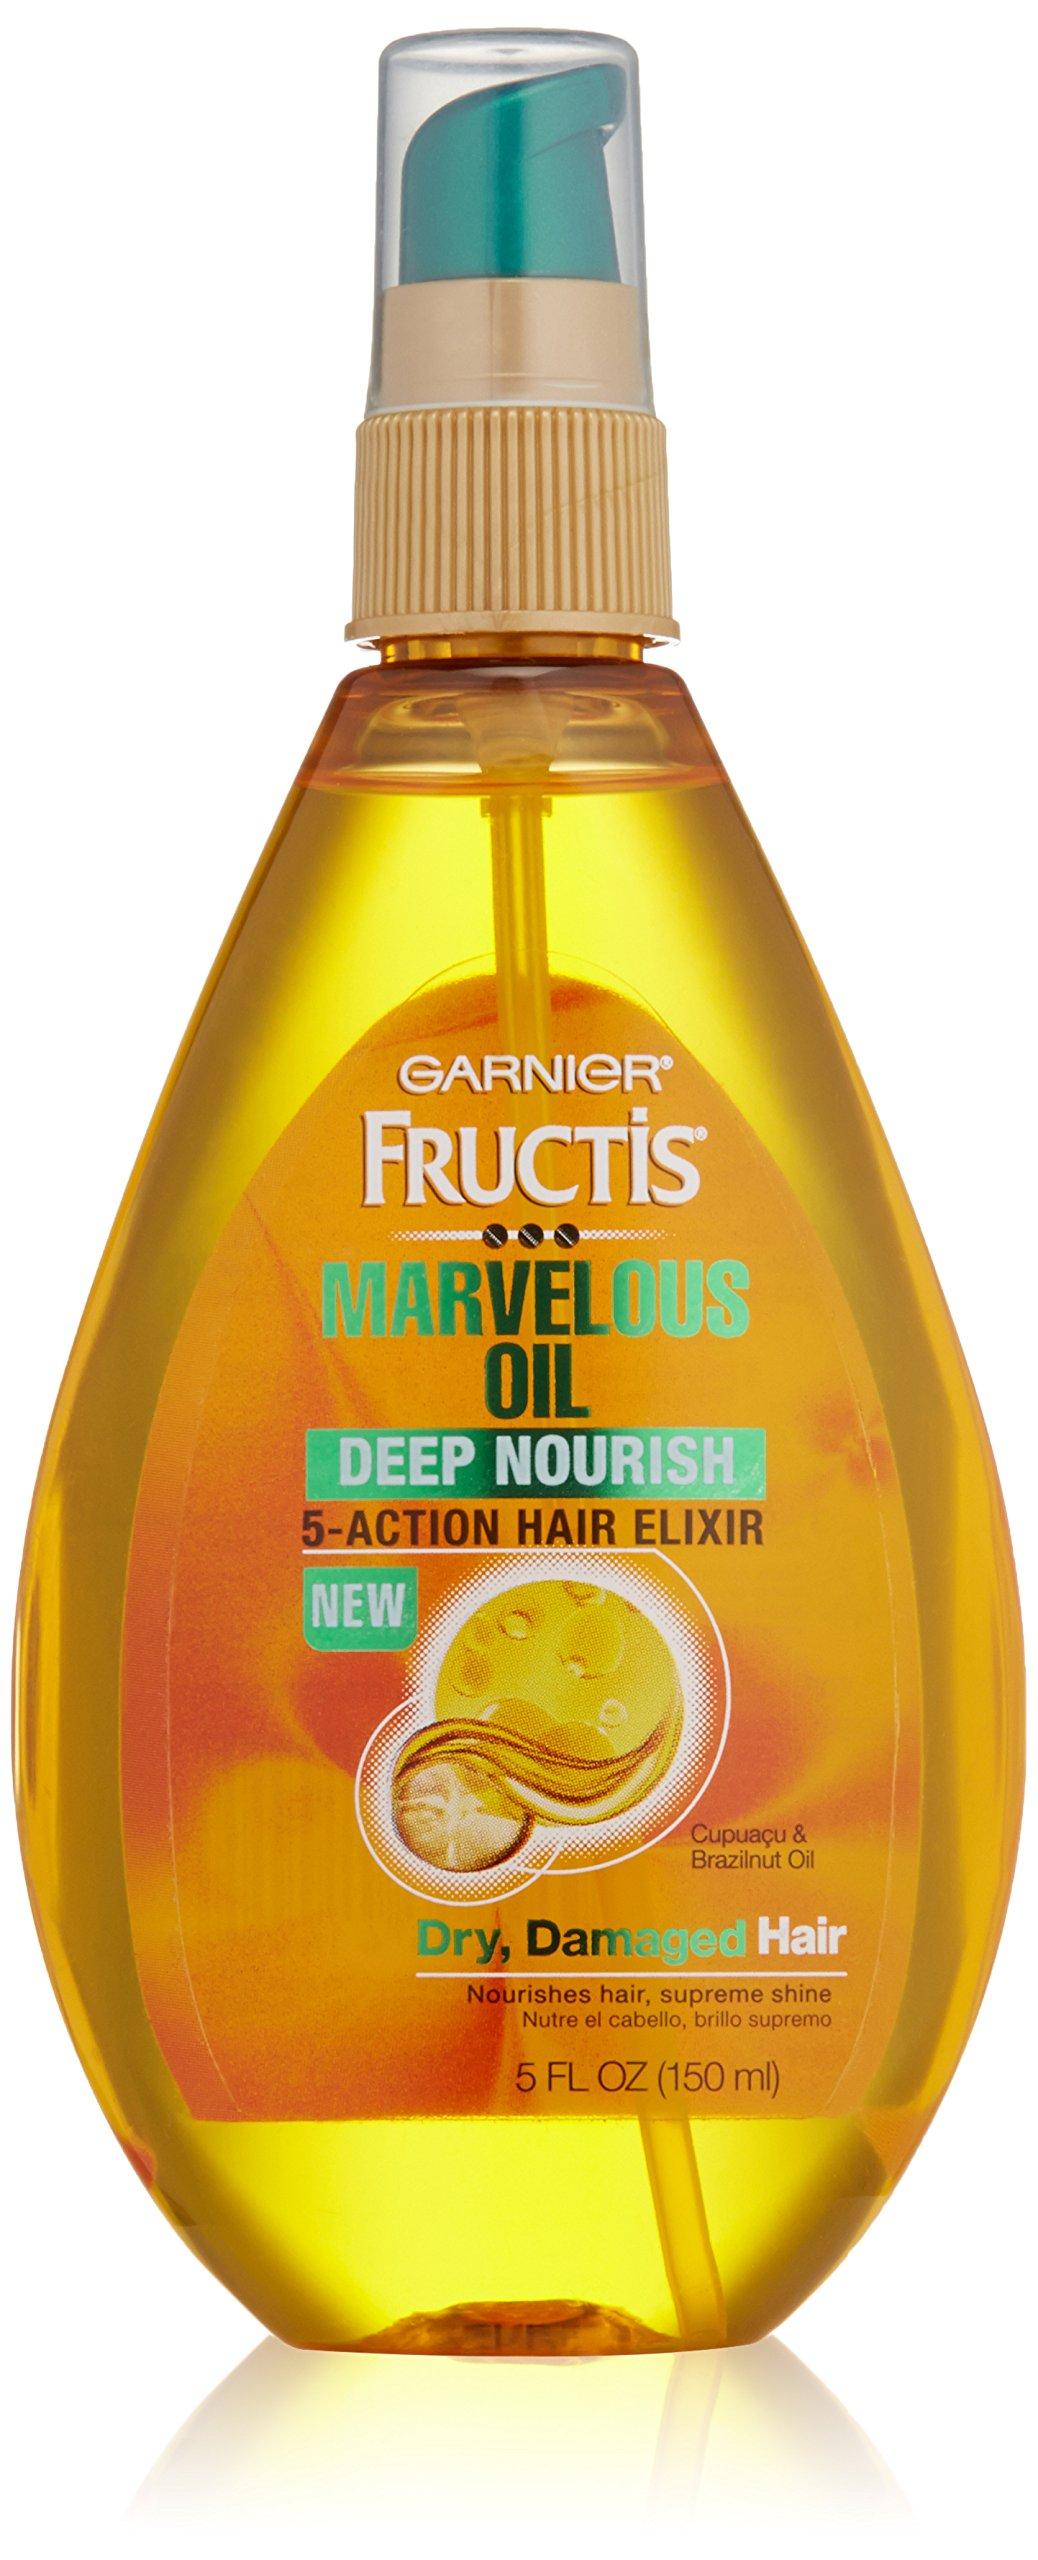 Garnier Fructis Marvelous Nourish 5 Action